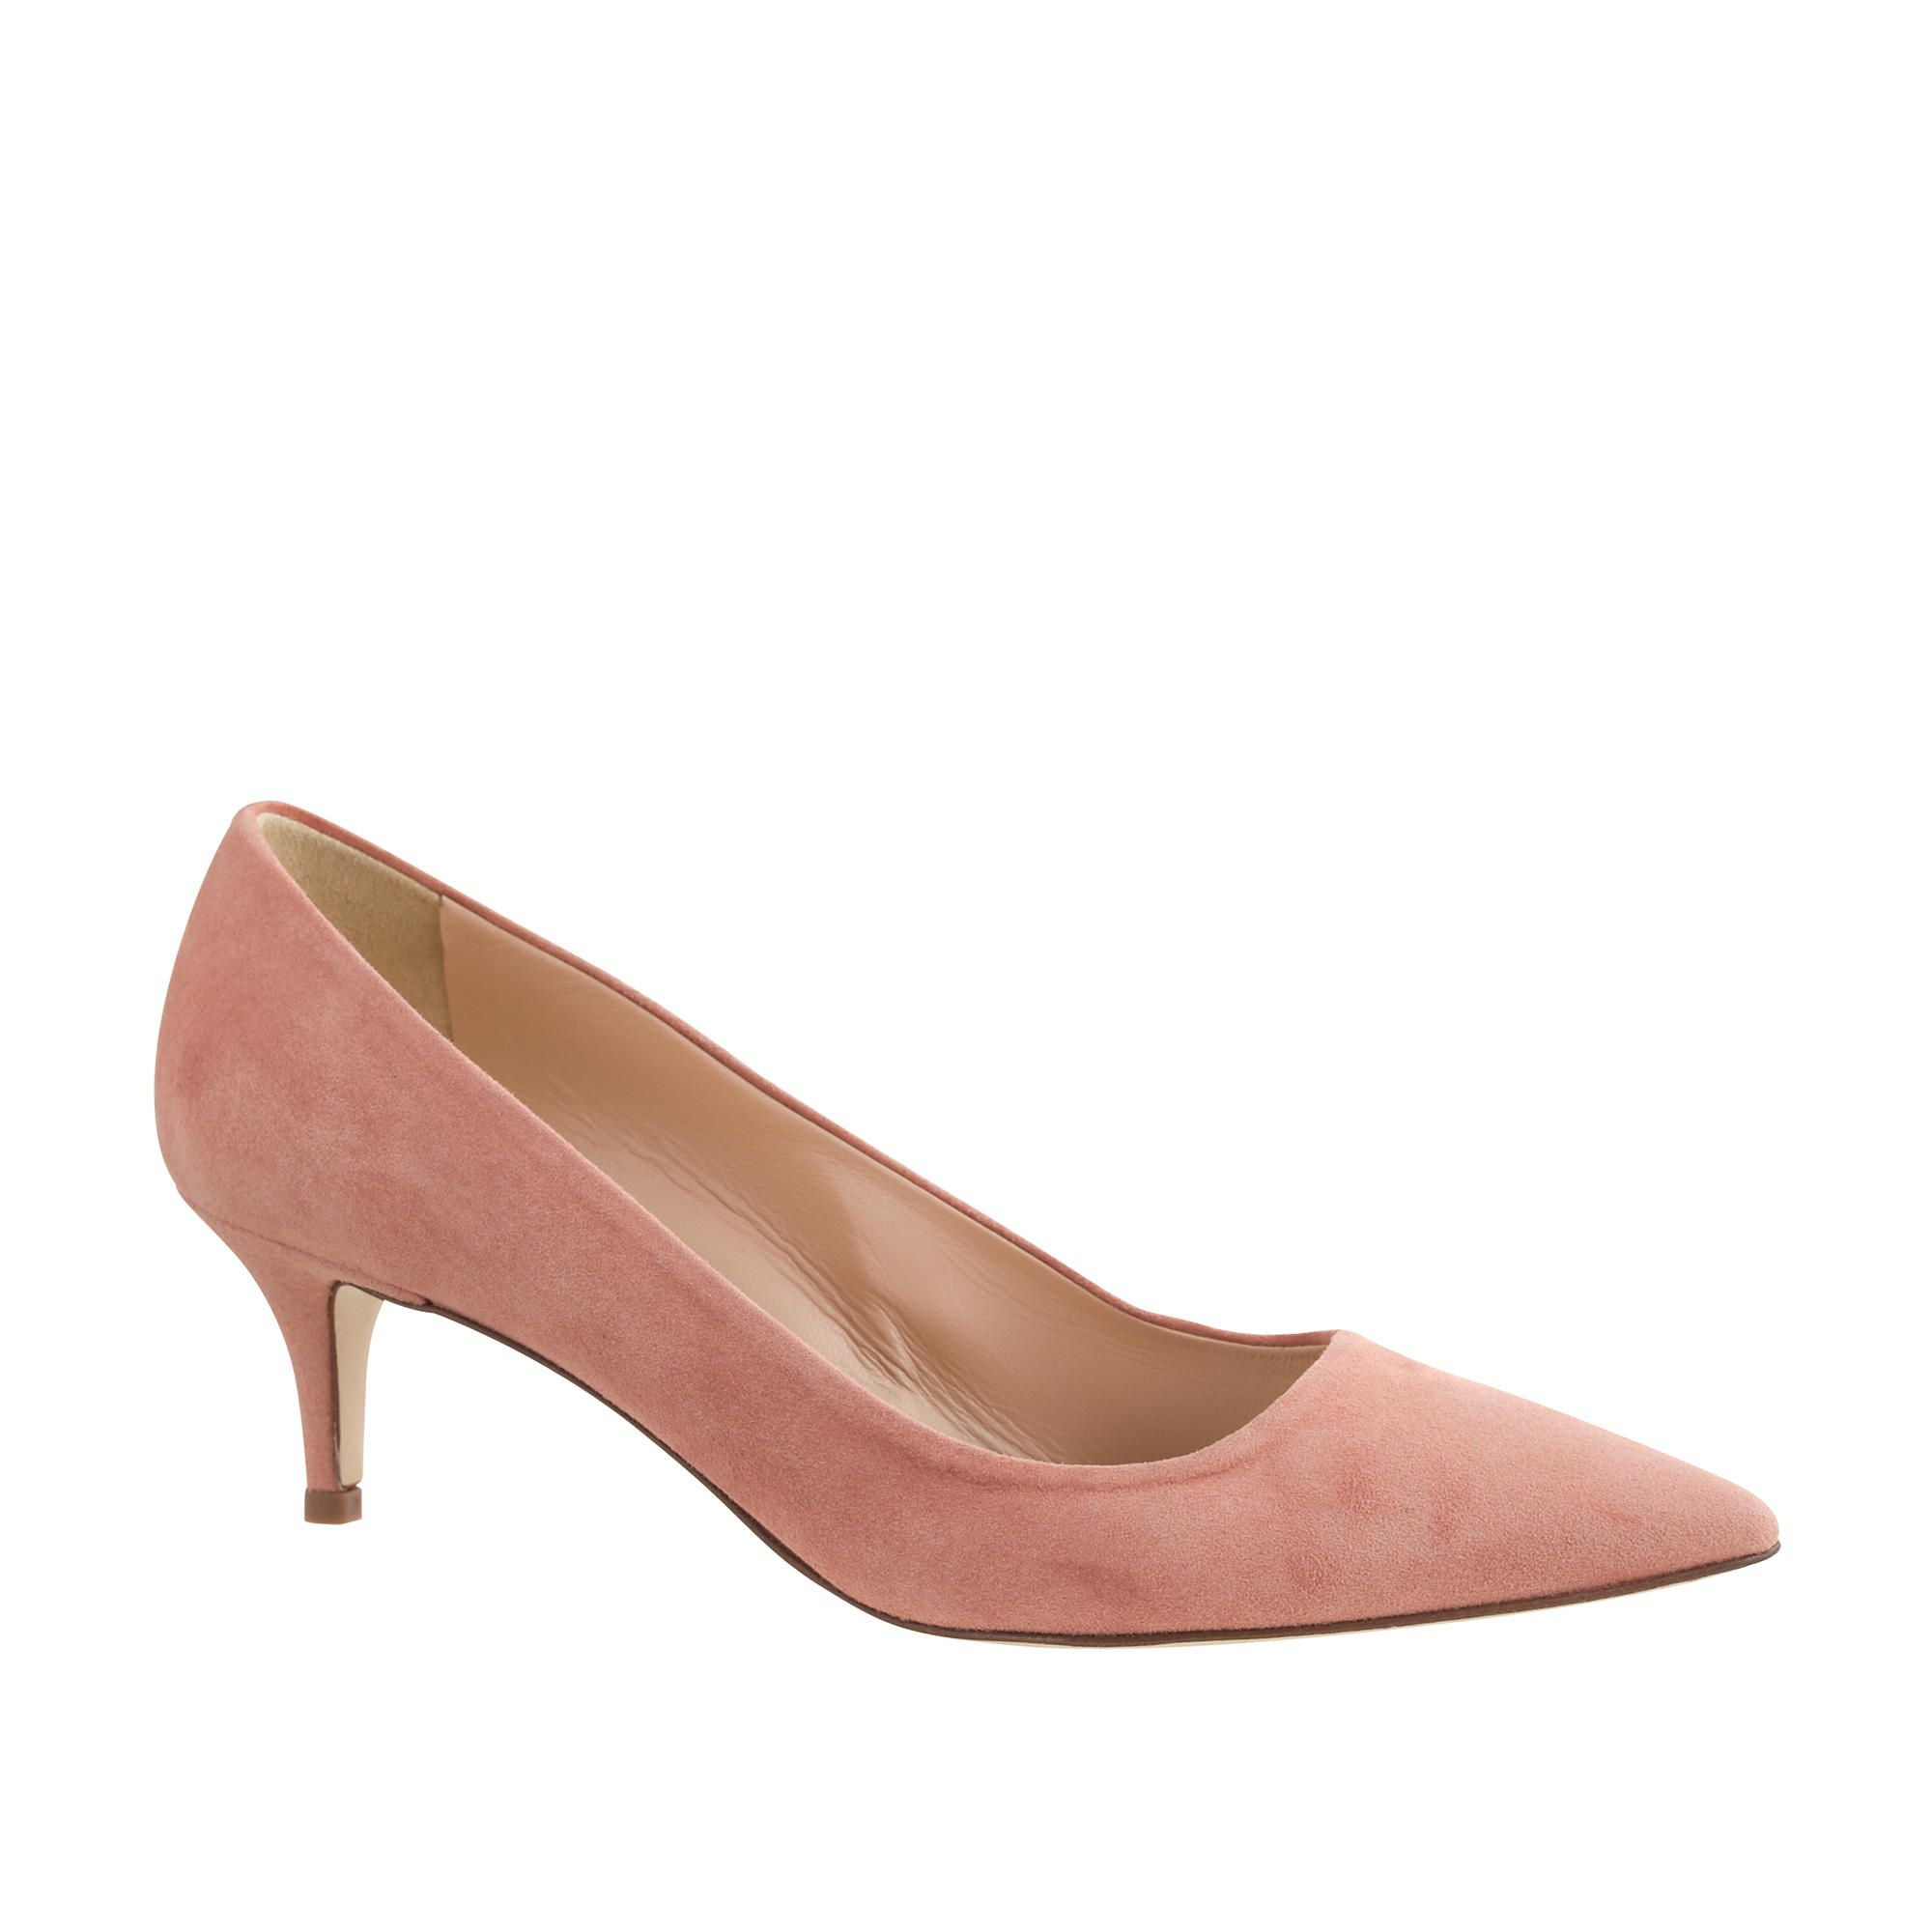 Dulci Suede Kitten Heels 150 Final Sale Heels Kitten Heels Outfit Interview Shoes